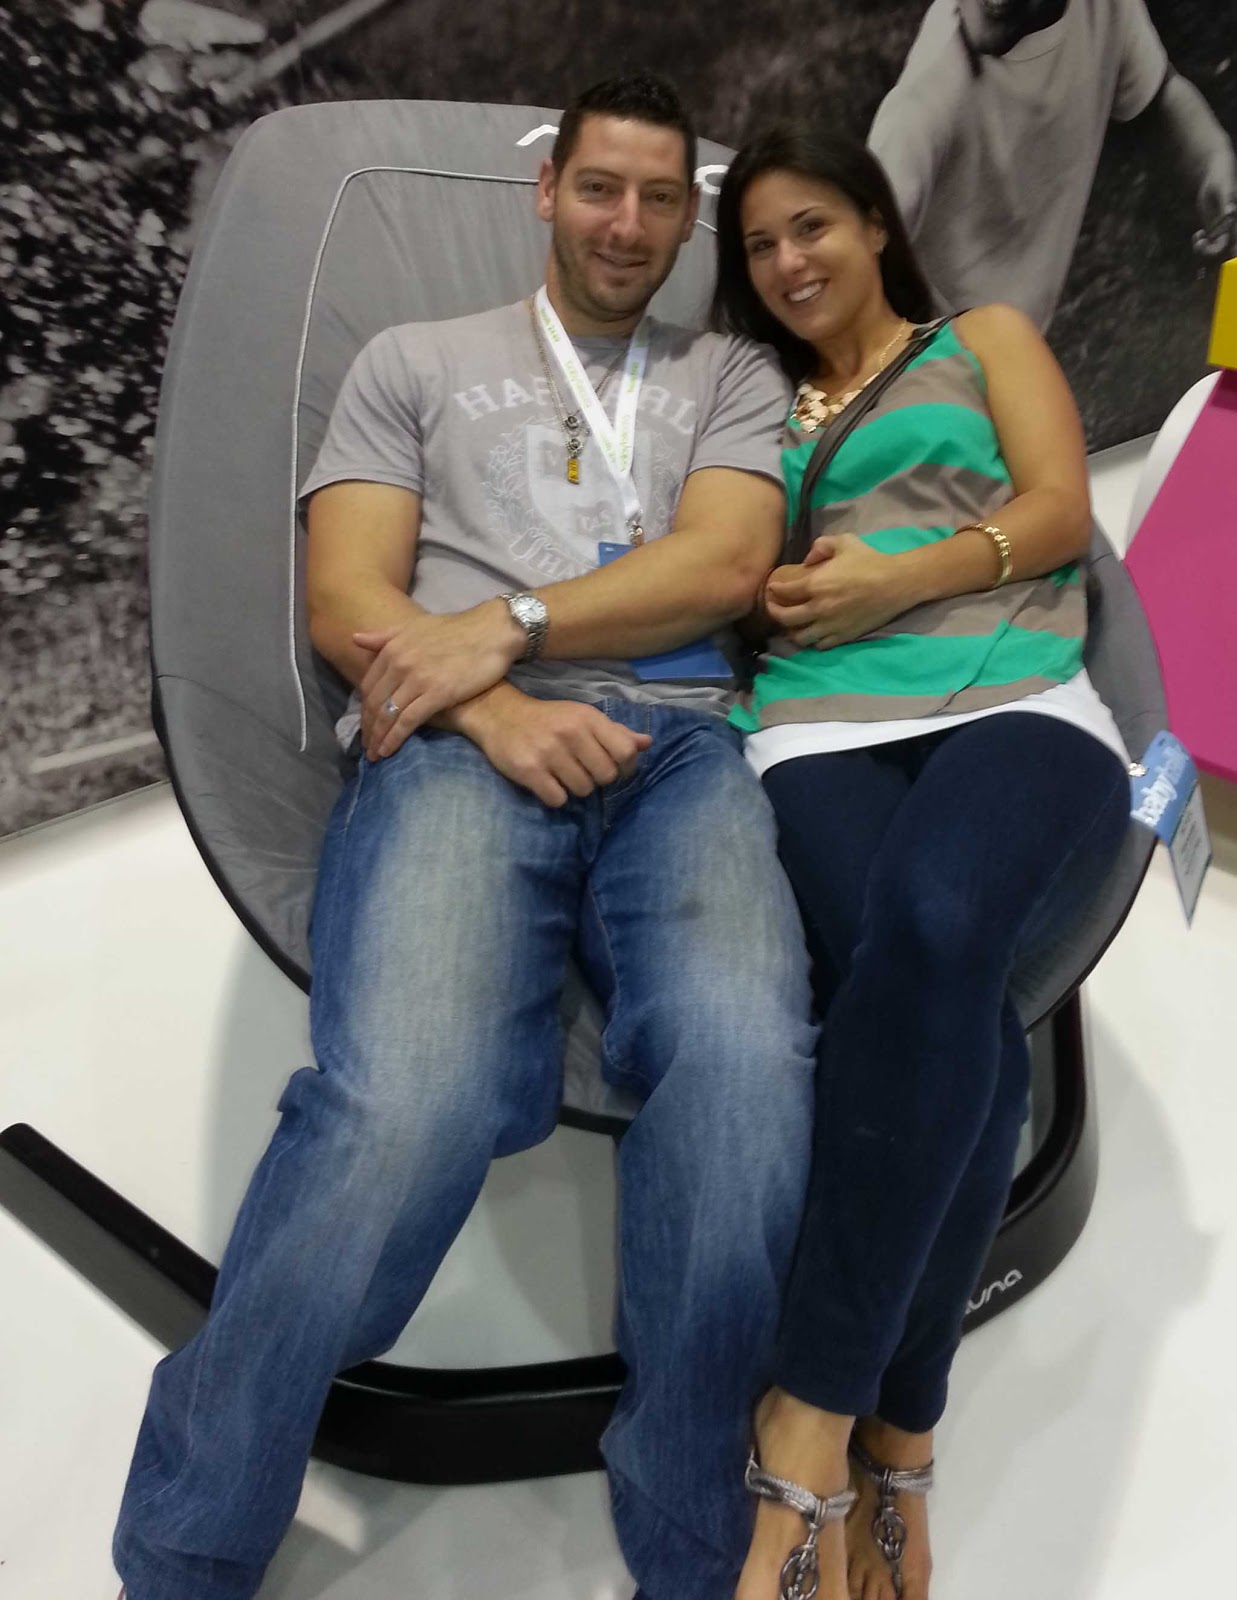 adult baby high chair stool modern nlb cool new product brand alert nuna